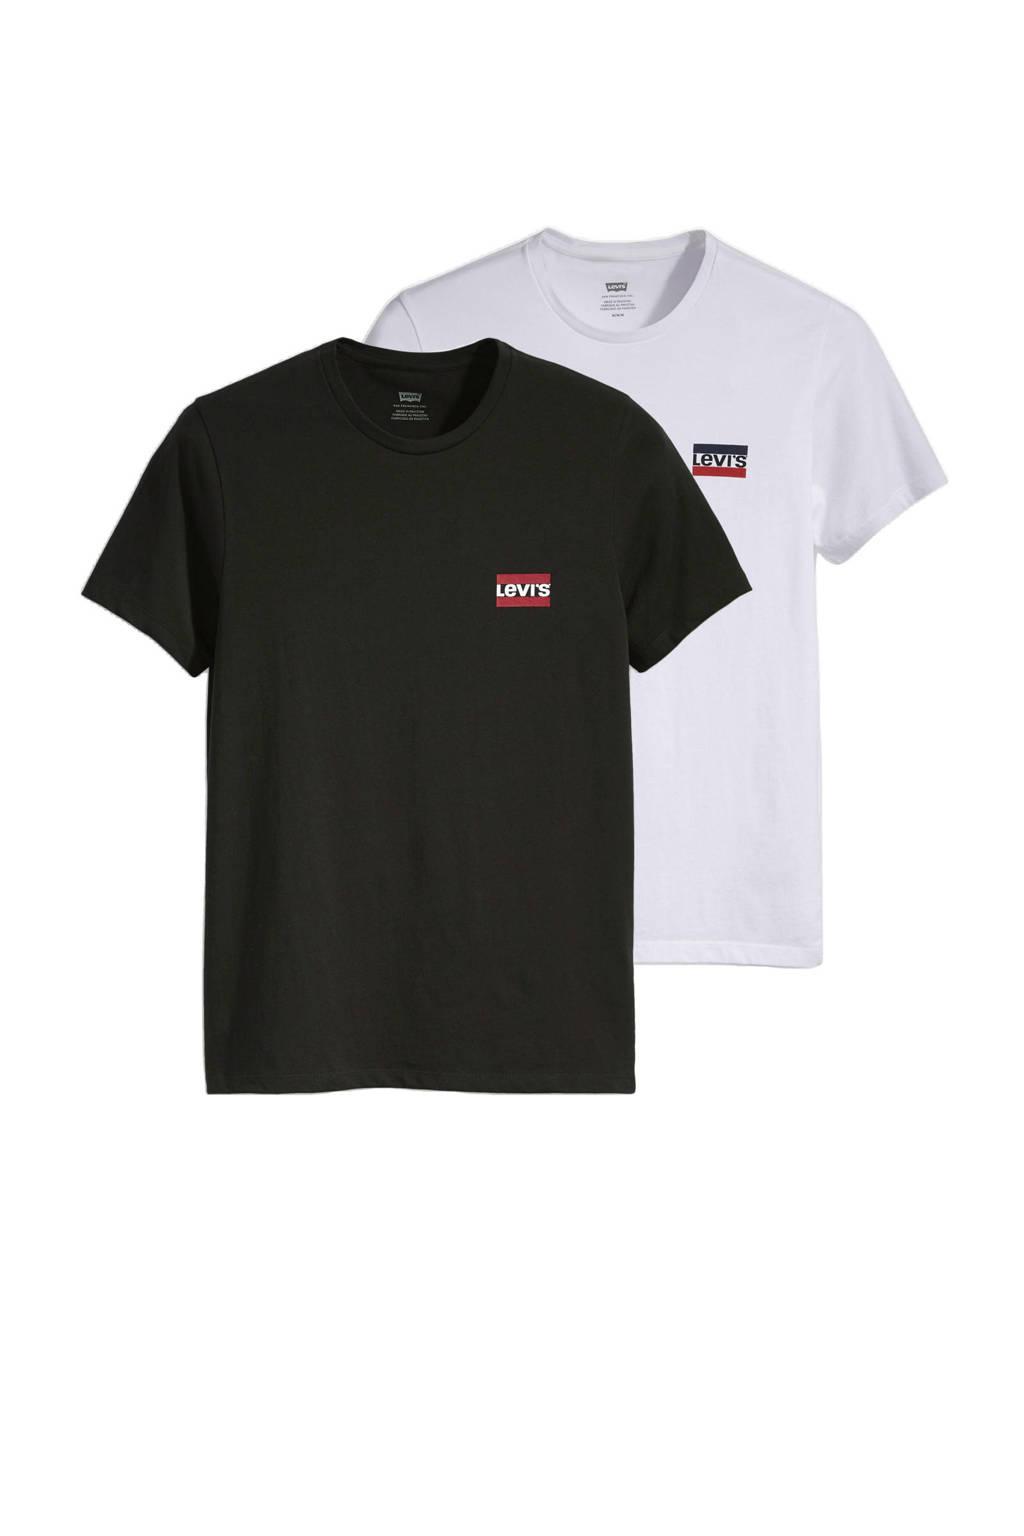 Levi's T-shirt - set van 2, Zwart/wit